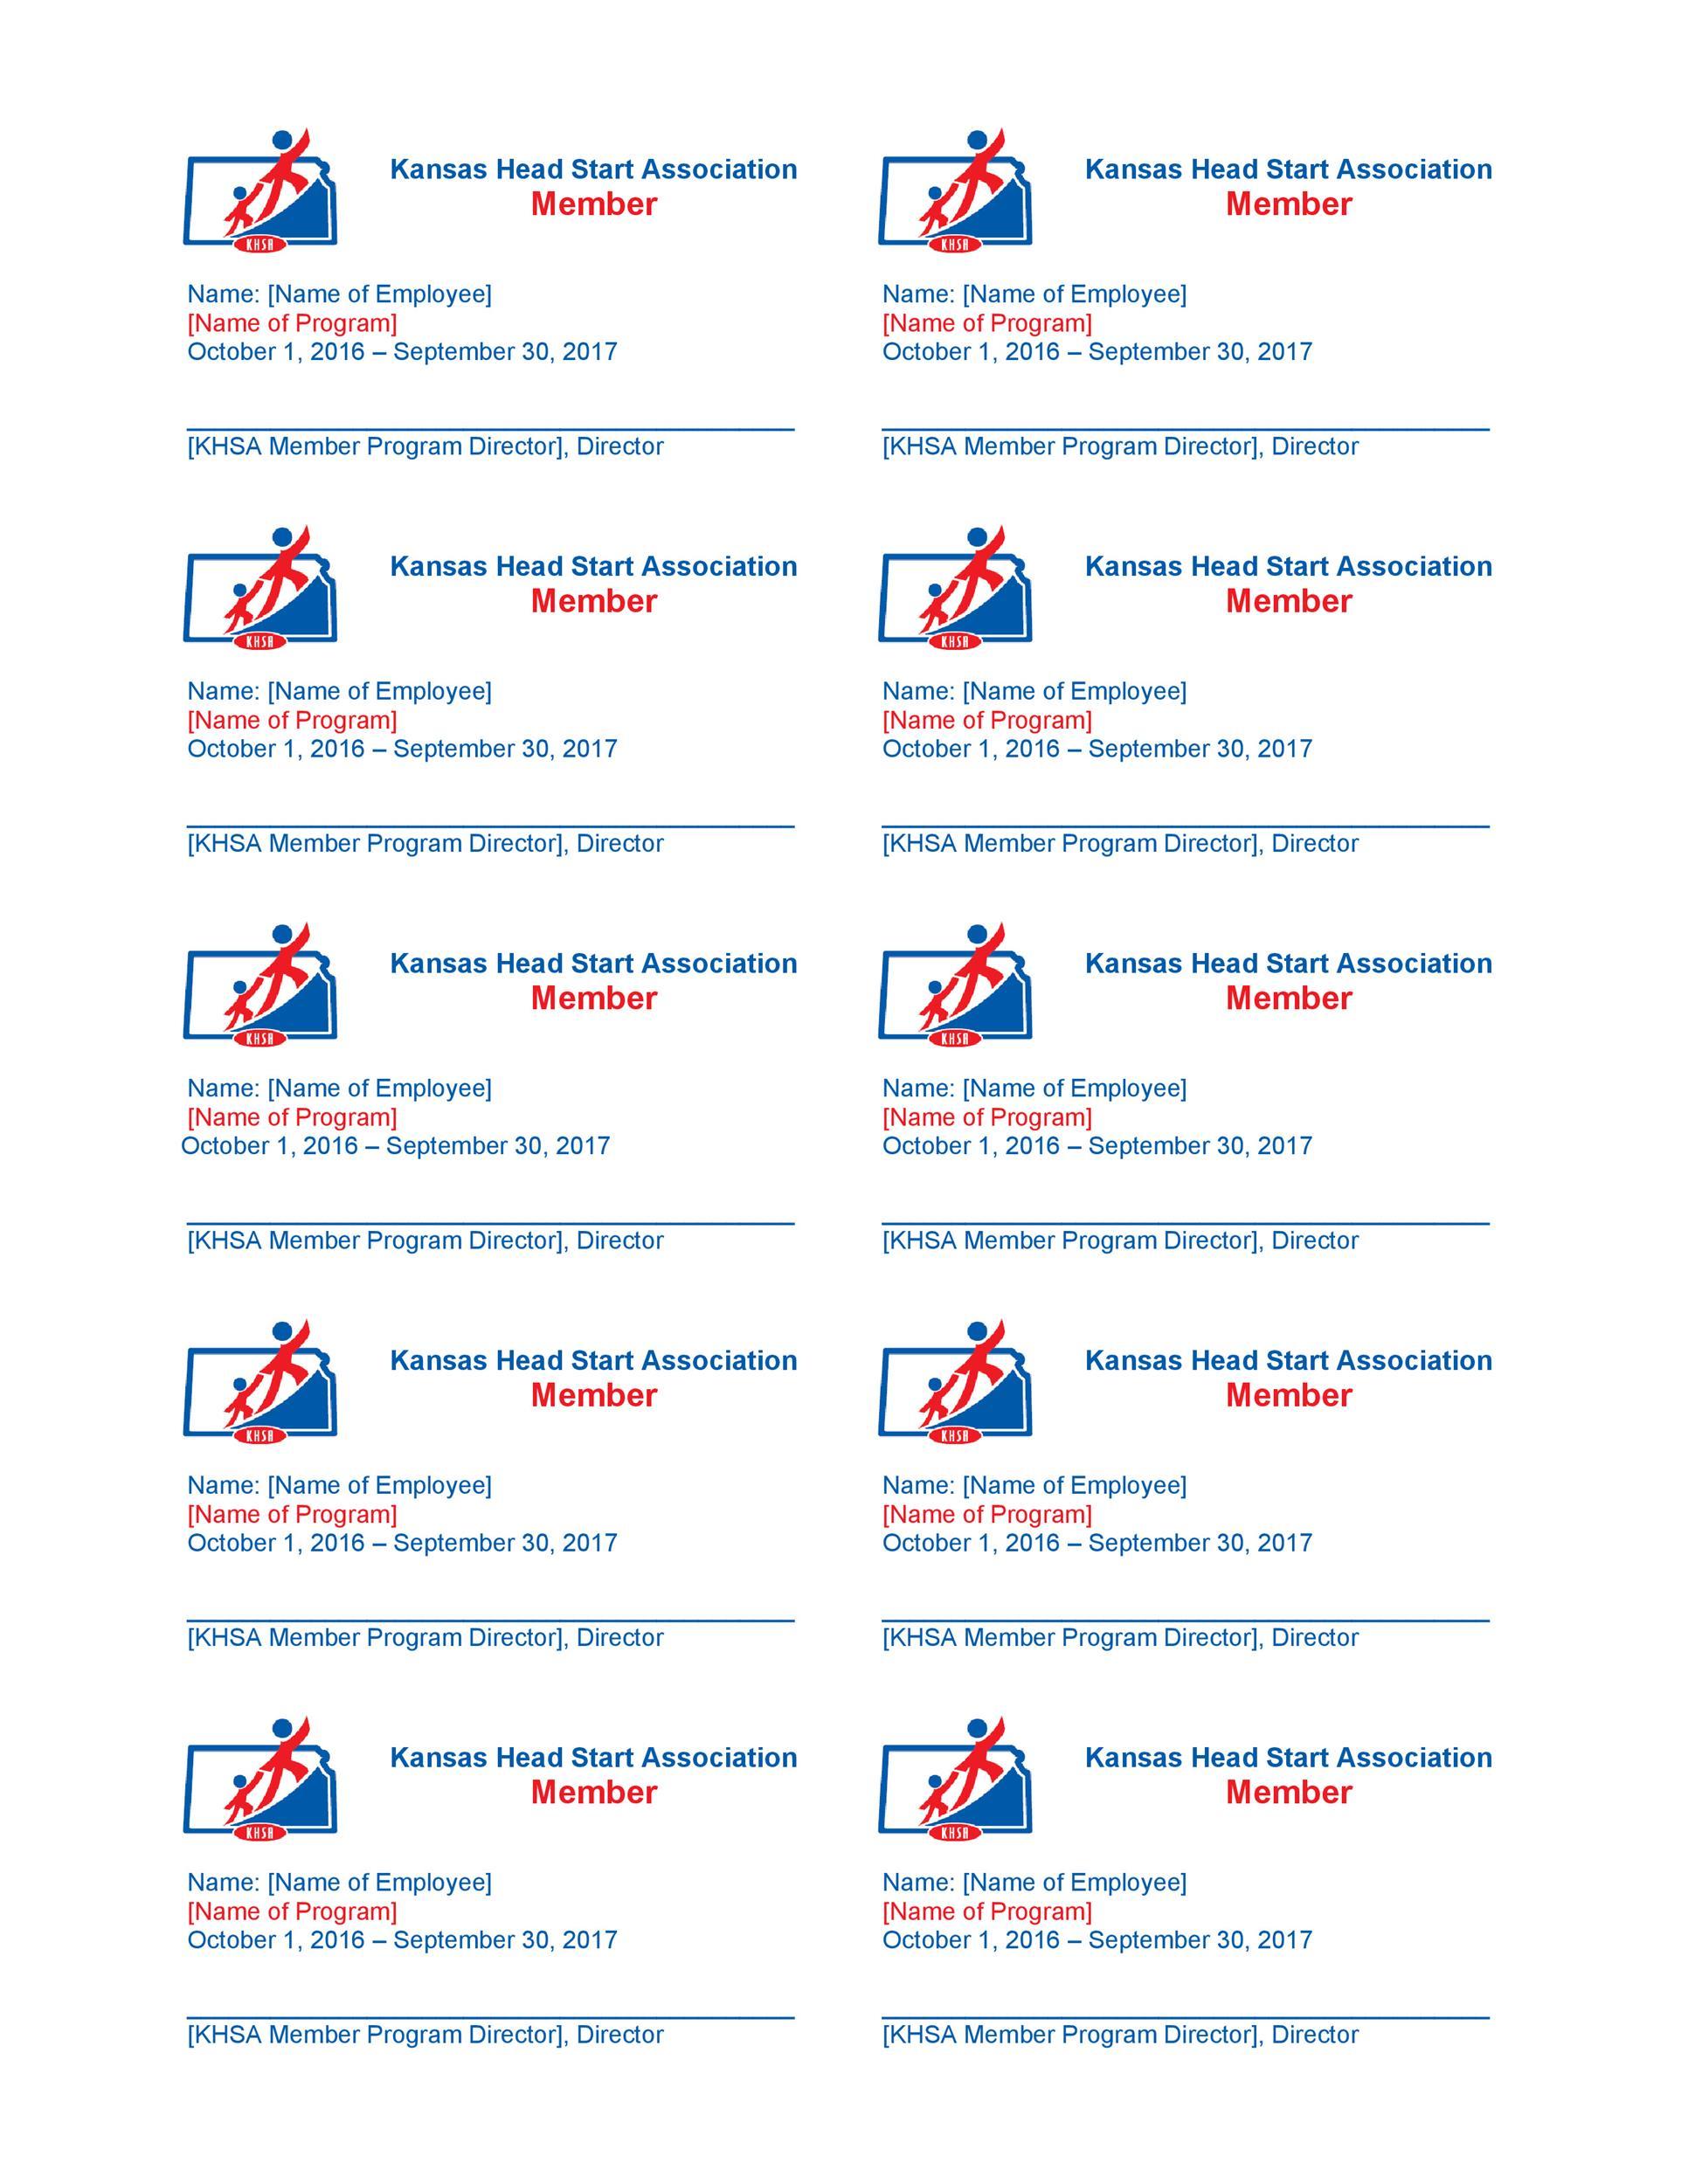 25 Cool Membership Card Templates & Designs (MS Word) ᐅ ...